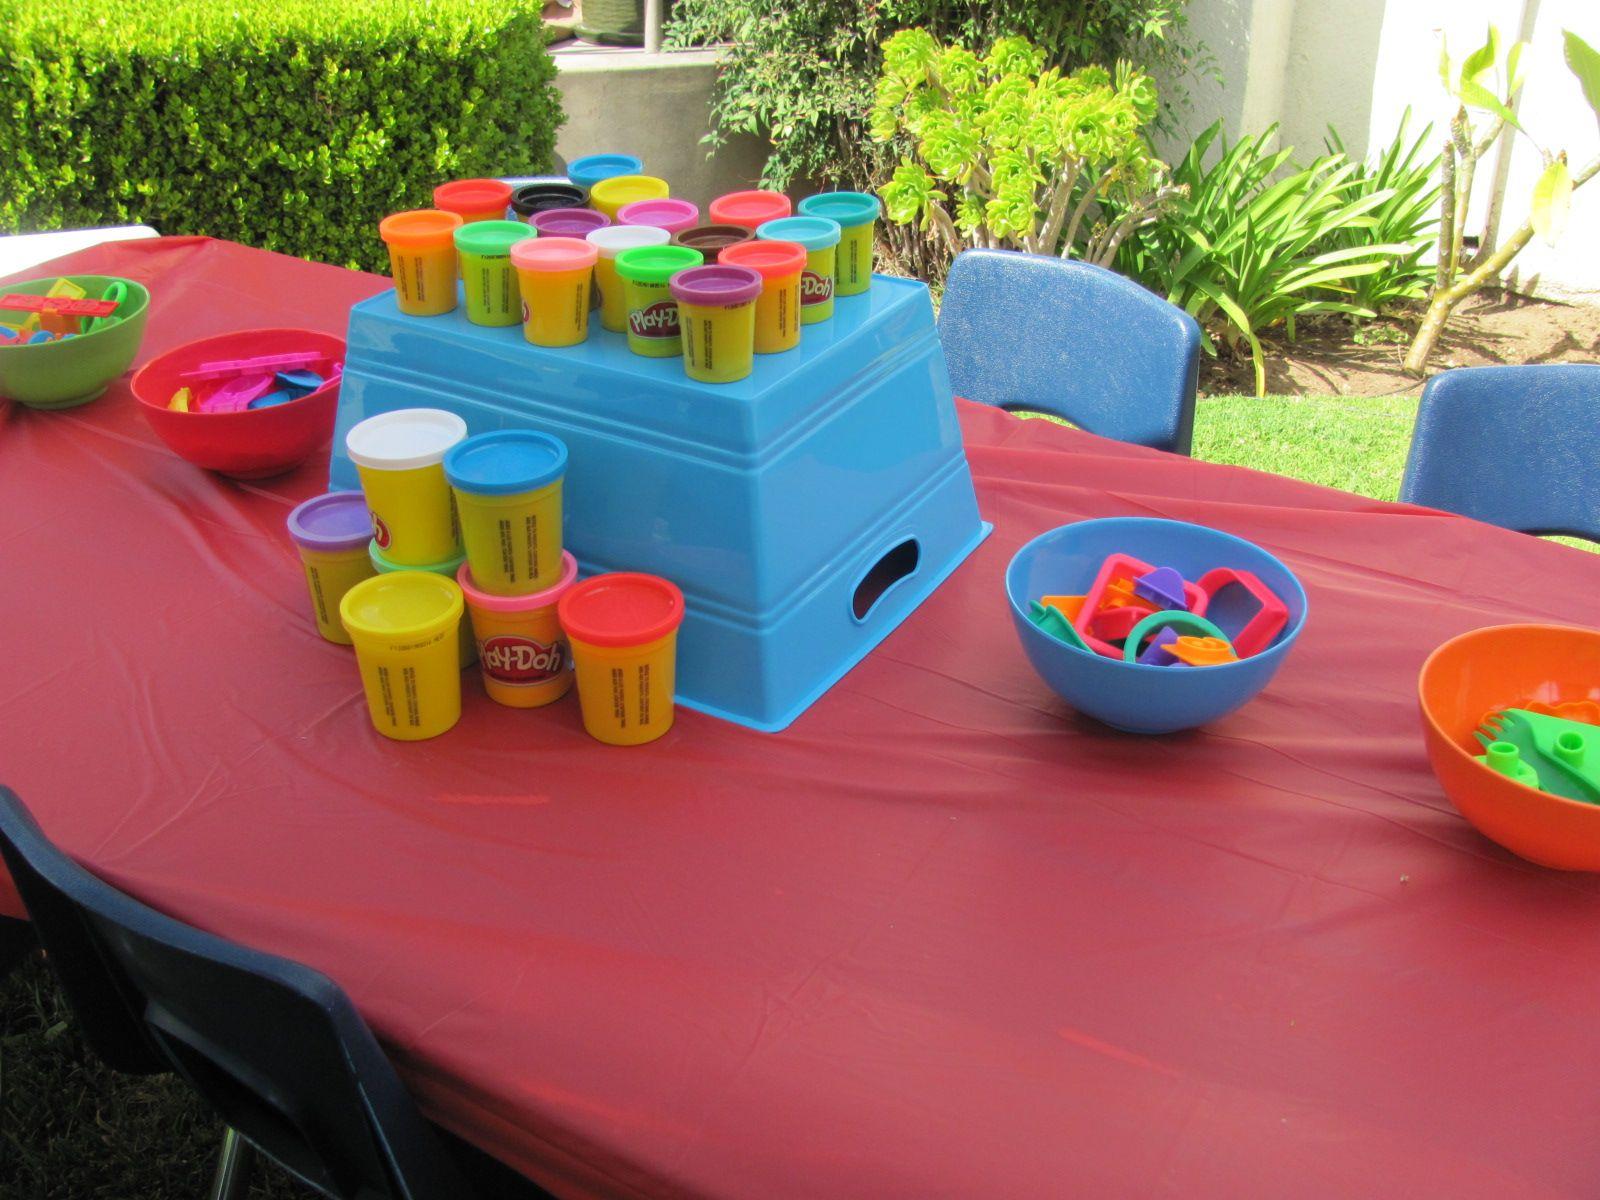 Crayola Birthday Party!Play-Doh Station